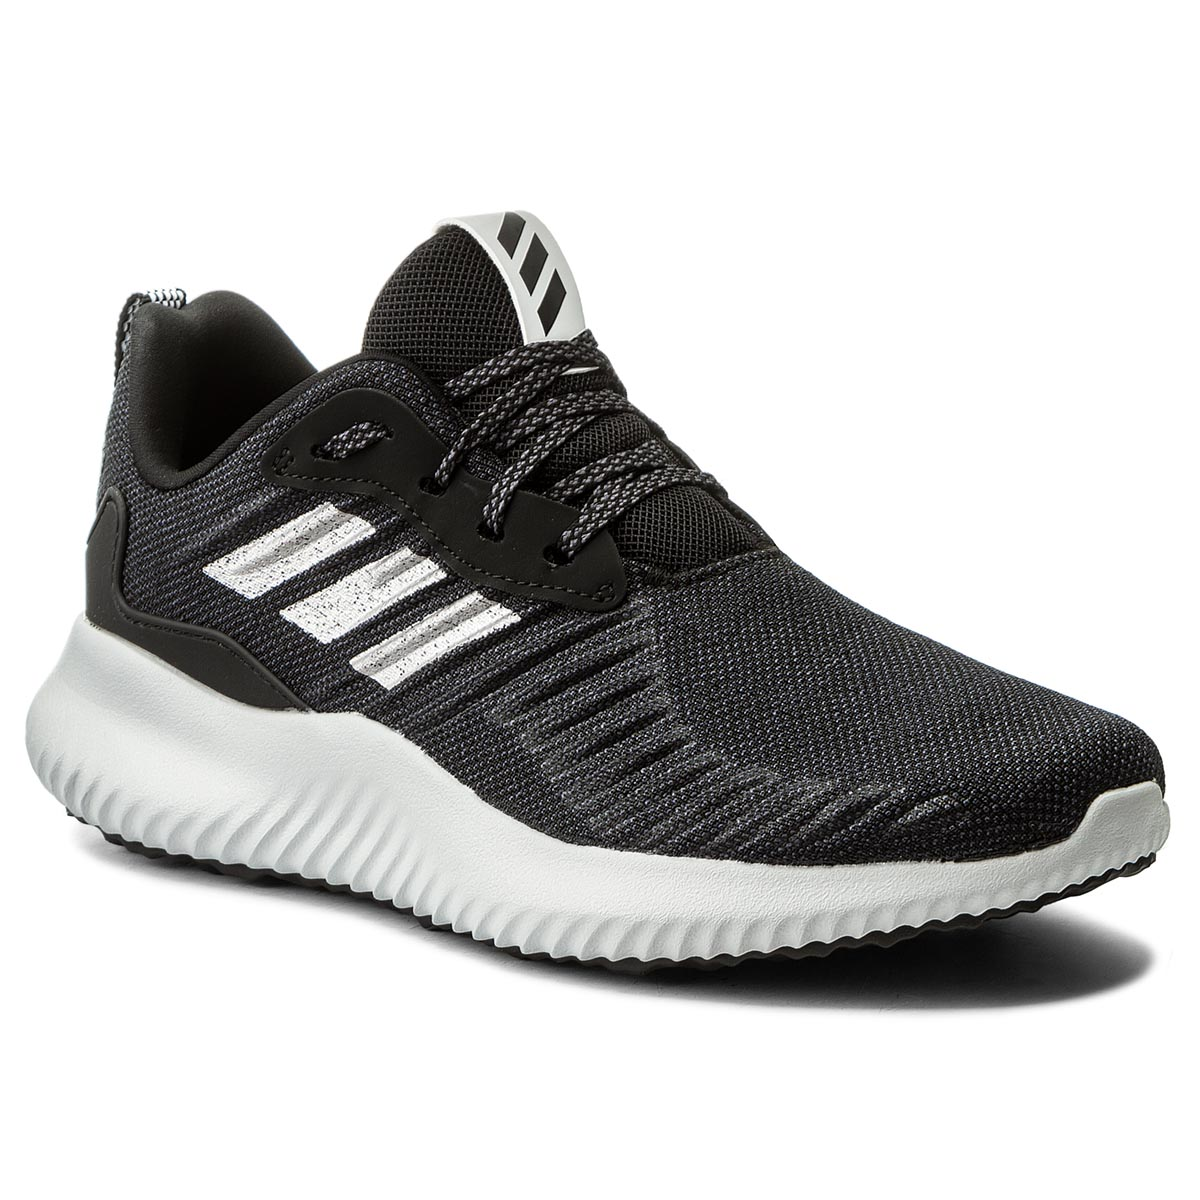 d15de559c Shoes adidas - Alphabounce Rc W CG4746 Trasca Scarle Cblack - Indoor ...